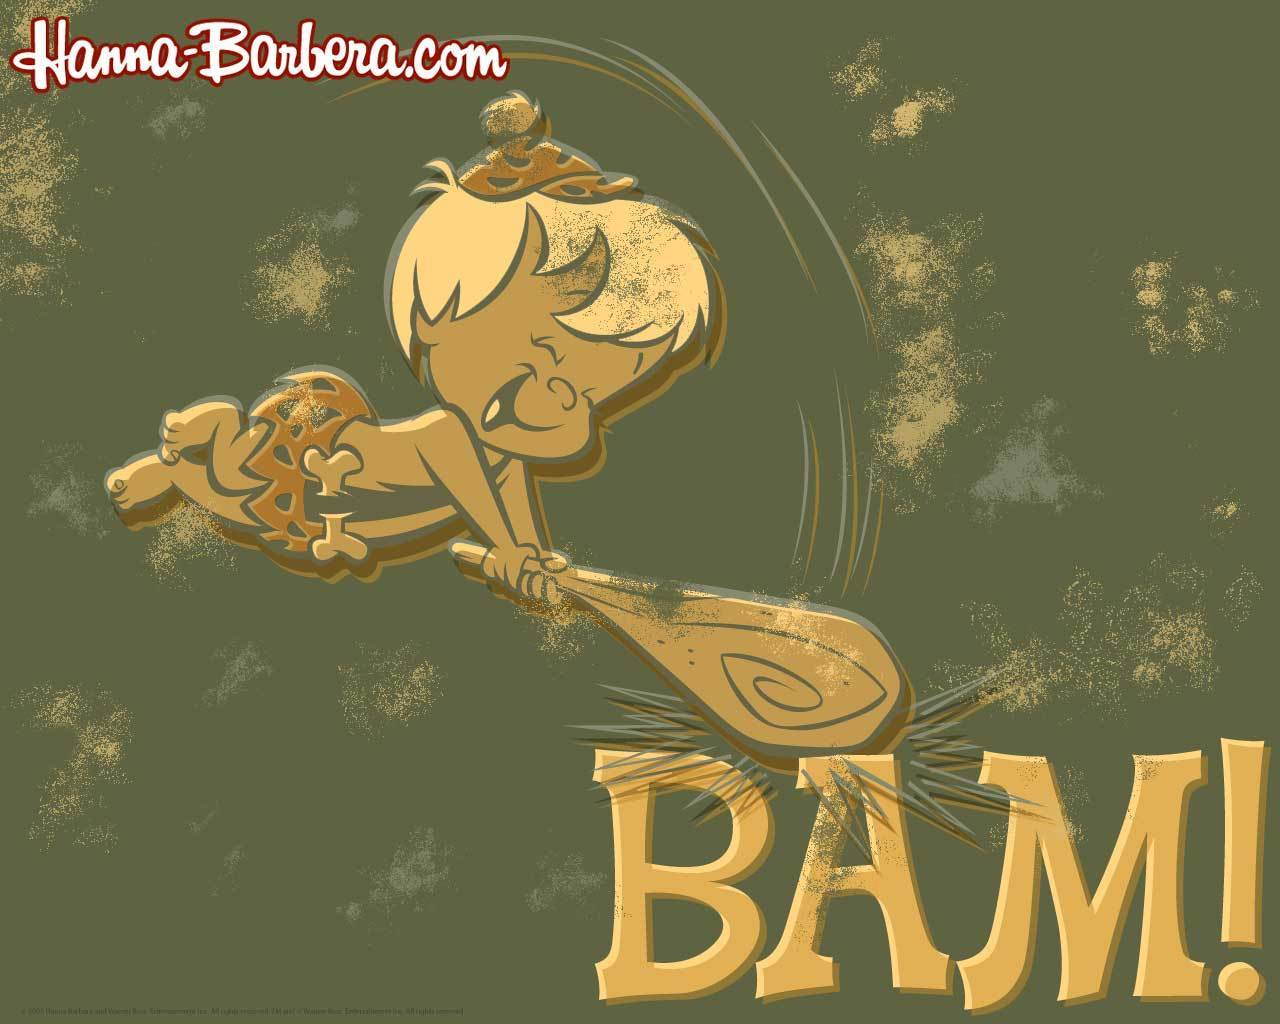 http://4.bp.blogspot.com/-4g9Ht1z5CTI/UAhpDi-JOSI/AAAAAAAAB5U/cAzuOg5ZOIU/s1600/Bamm-Bamm-Wallpaper-the-flintstones-5421843-1280-1024.jpg